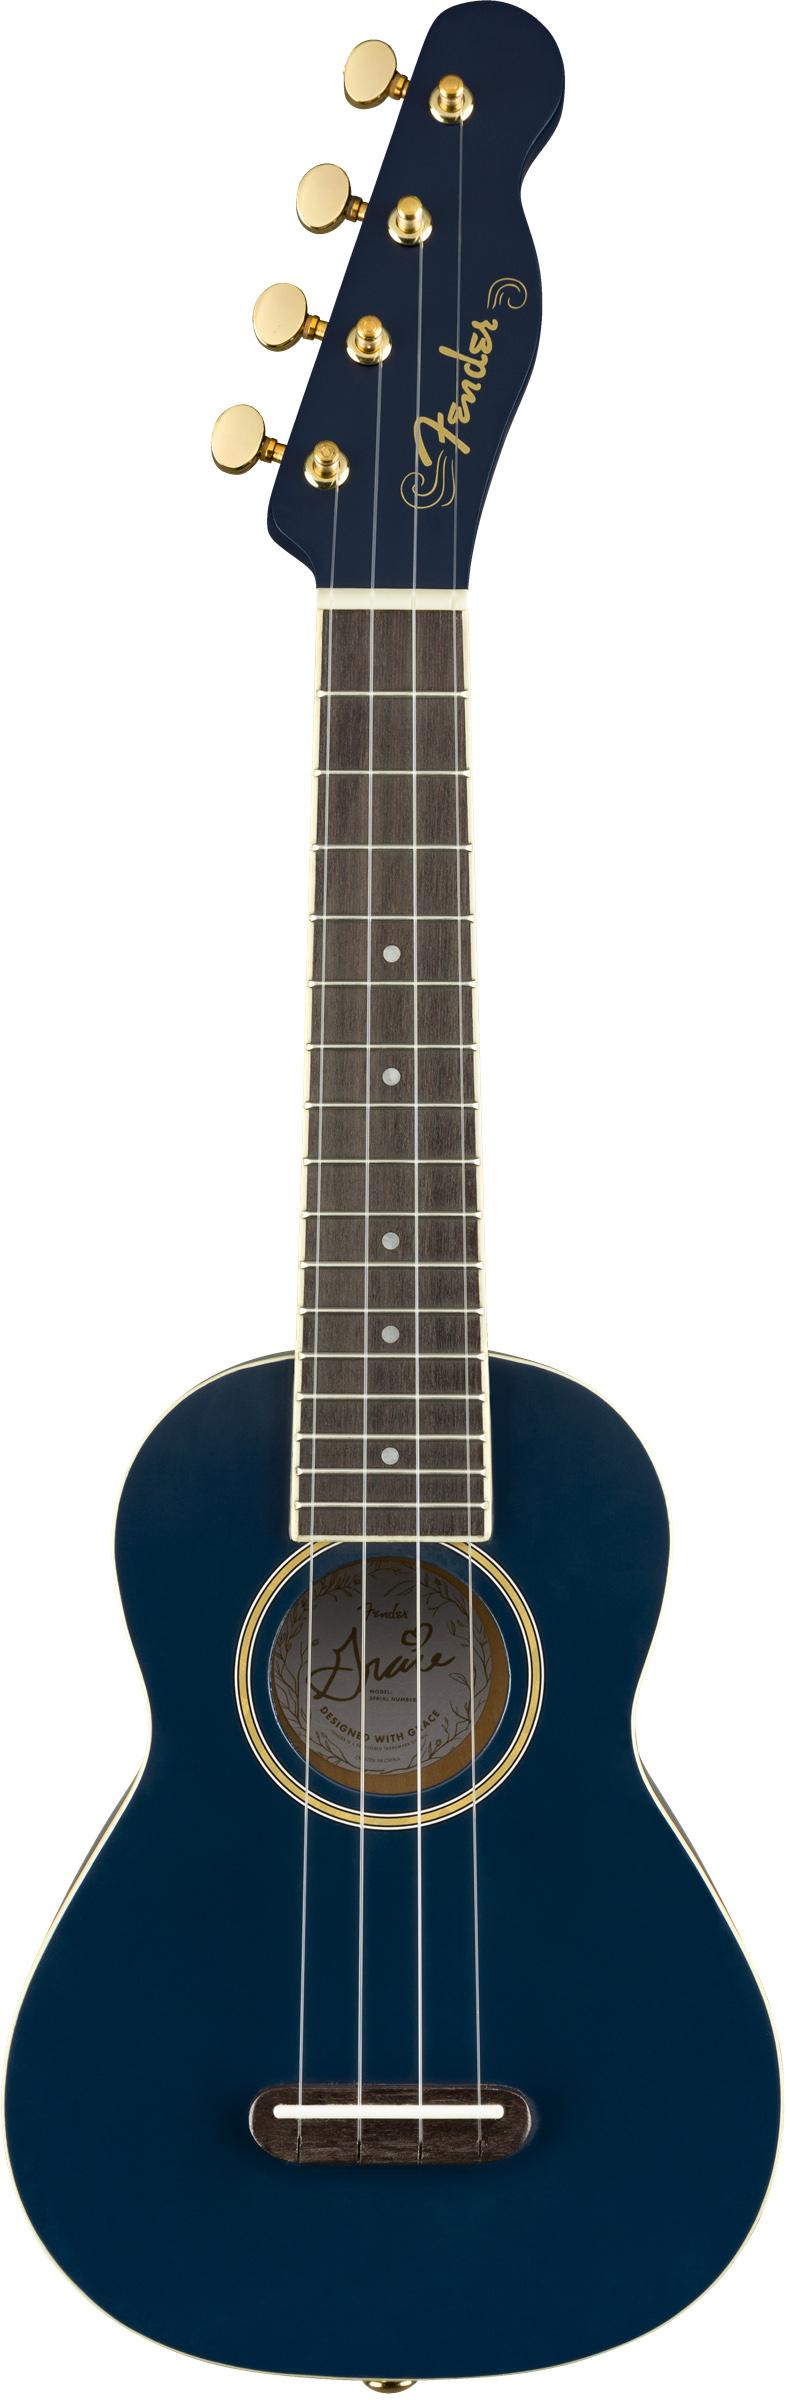 Fender Grace Vanderwaal Moonlight Soprano Ukulele 885978970896 Ebay